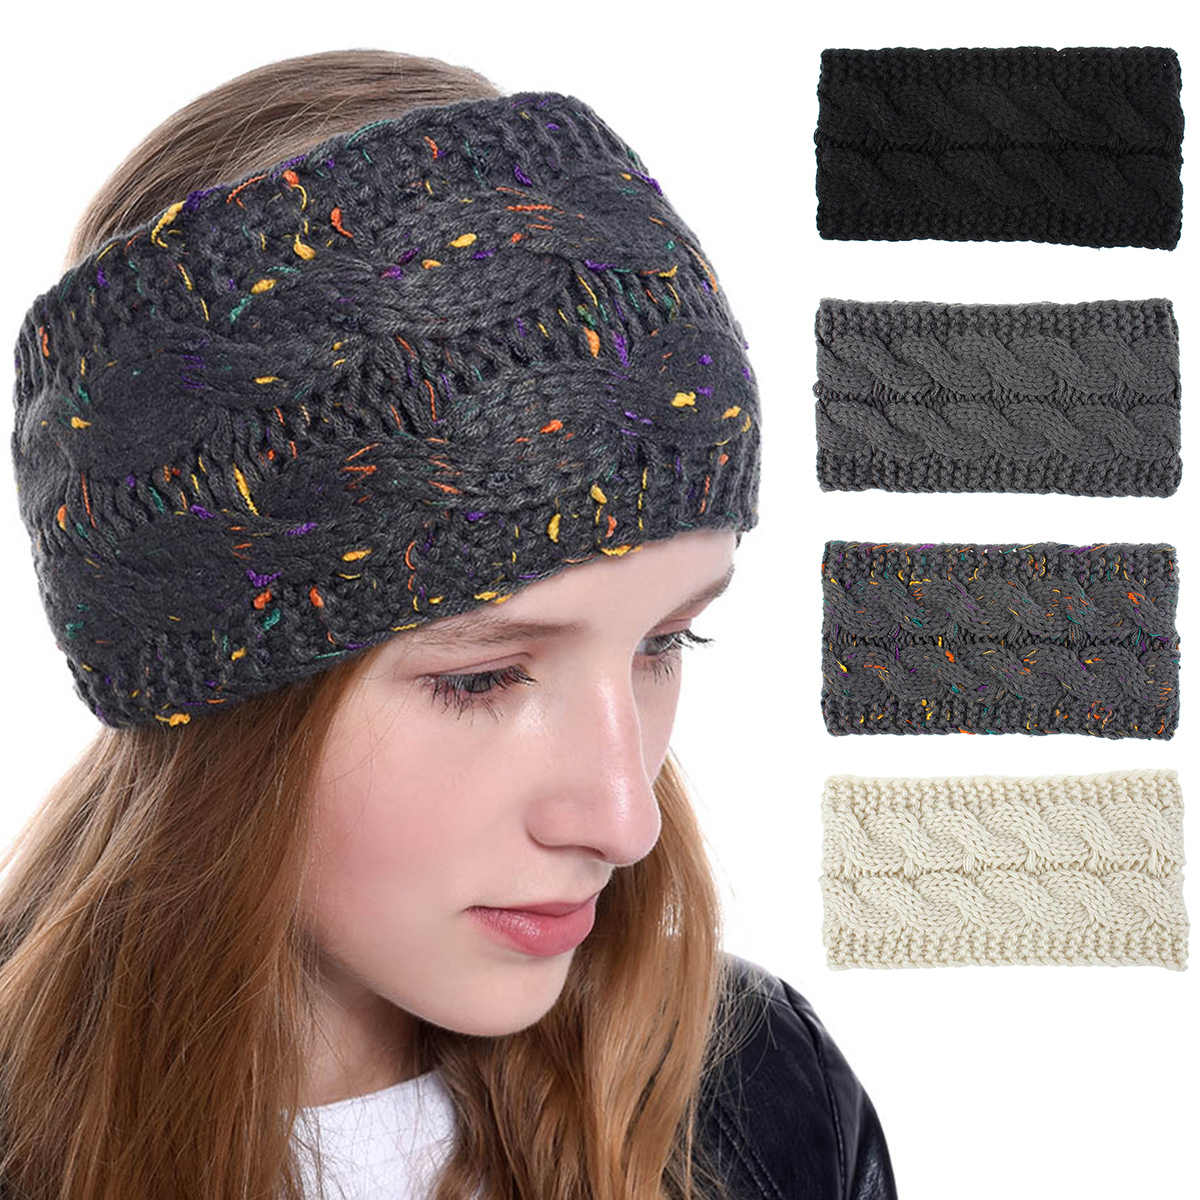 Multi Colorful Knitted Crochet Twist Women Headband Winter Ear Warmer Elastic Hair Band for Women's Wide Hair Accessories